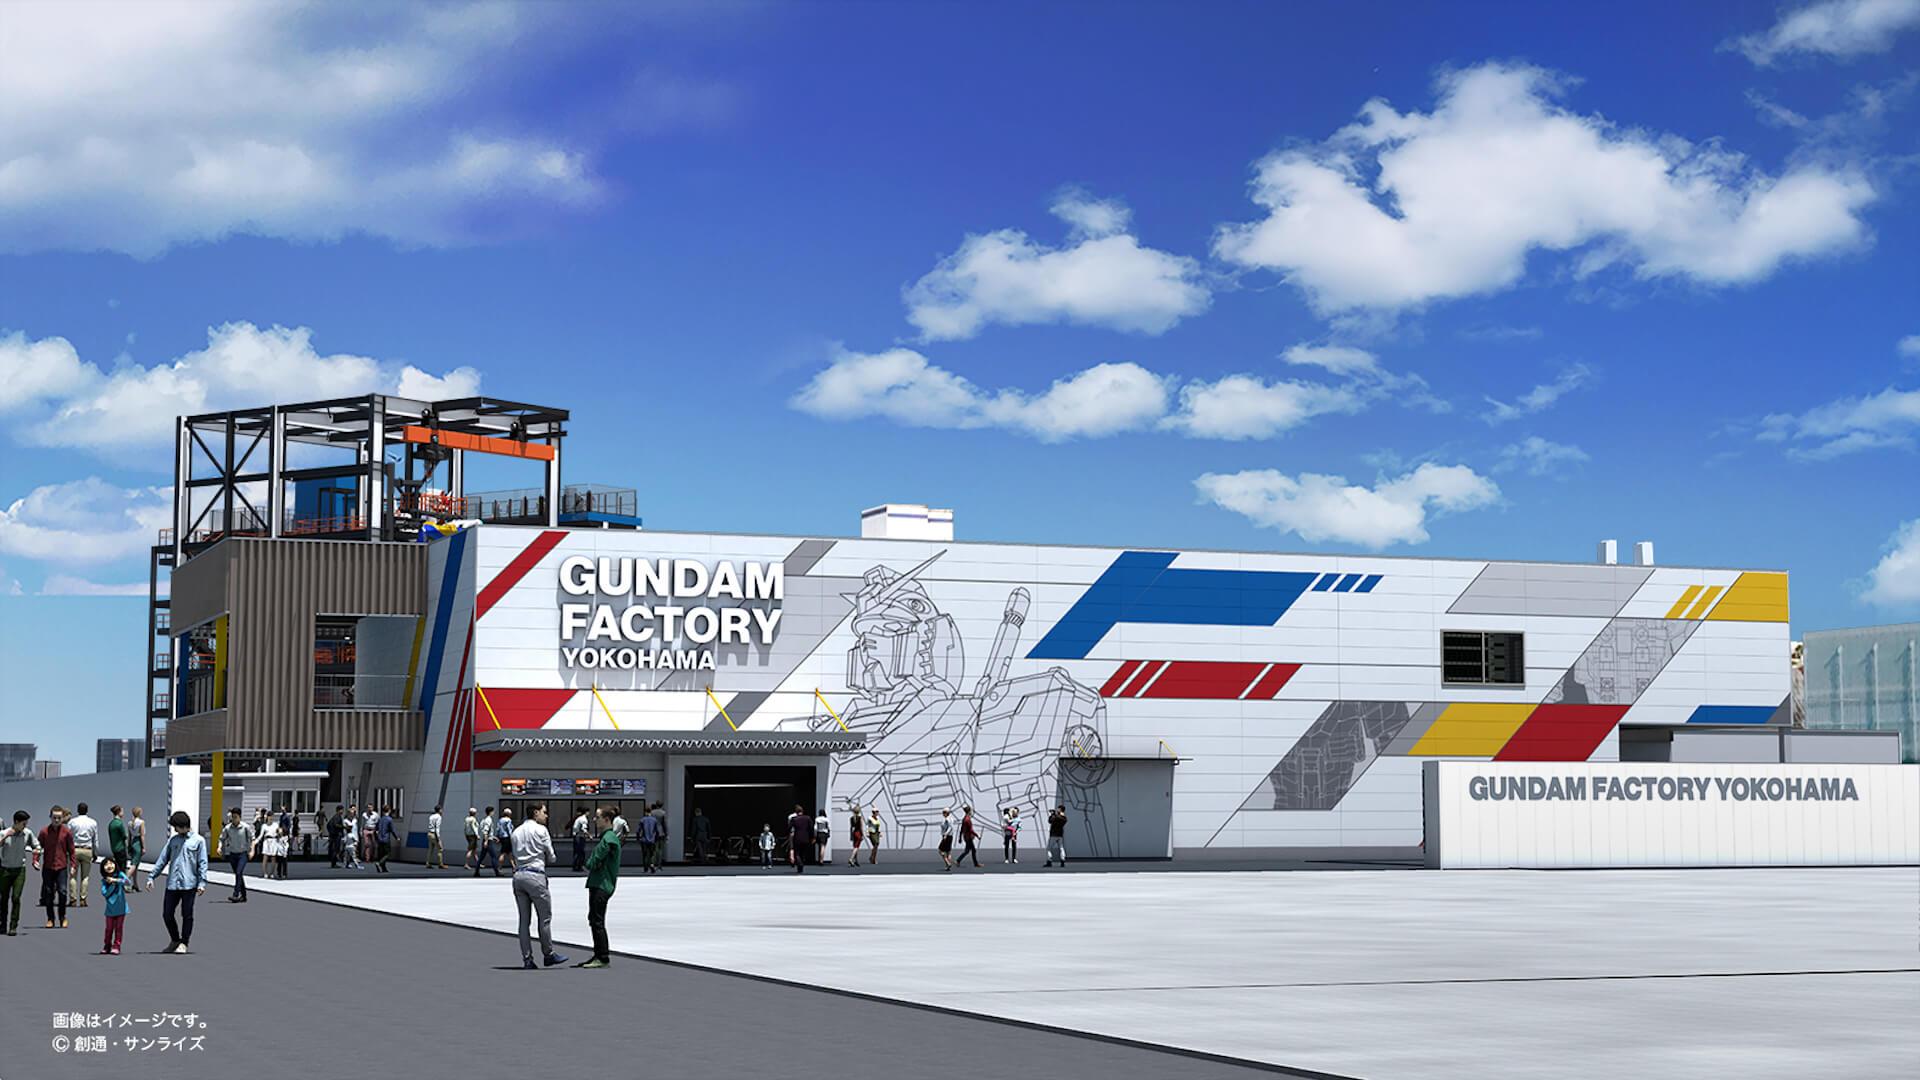 18mの動く実物大ガンダムが横浜に!「GUNDAM FACTORY YOKOHAMA」10月オープン art200120_gundam_5